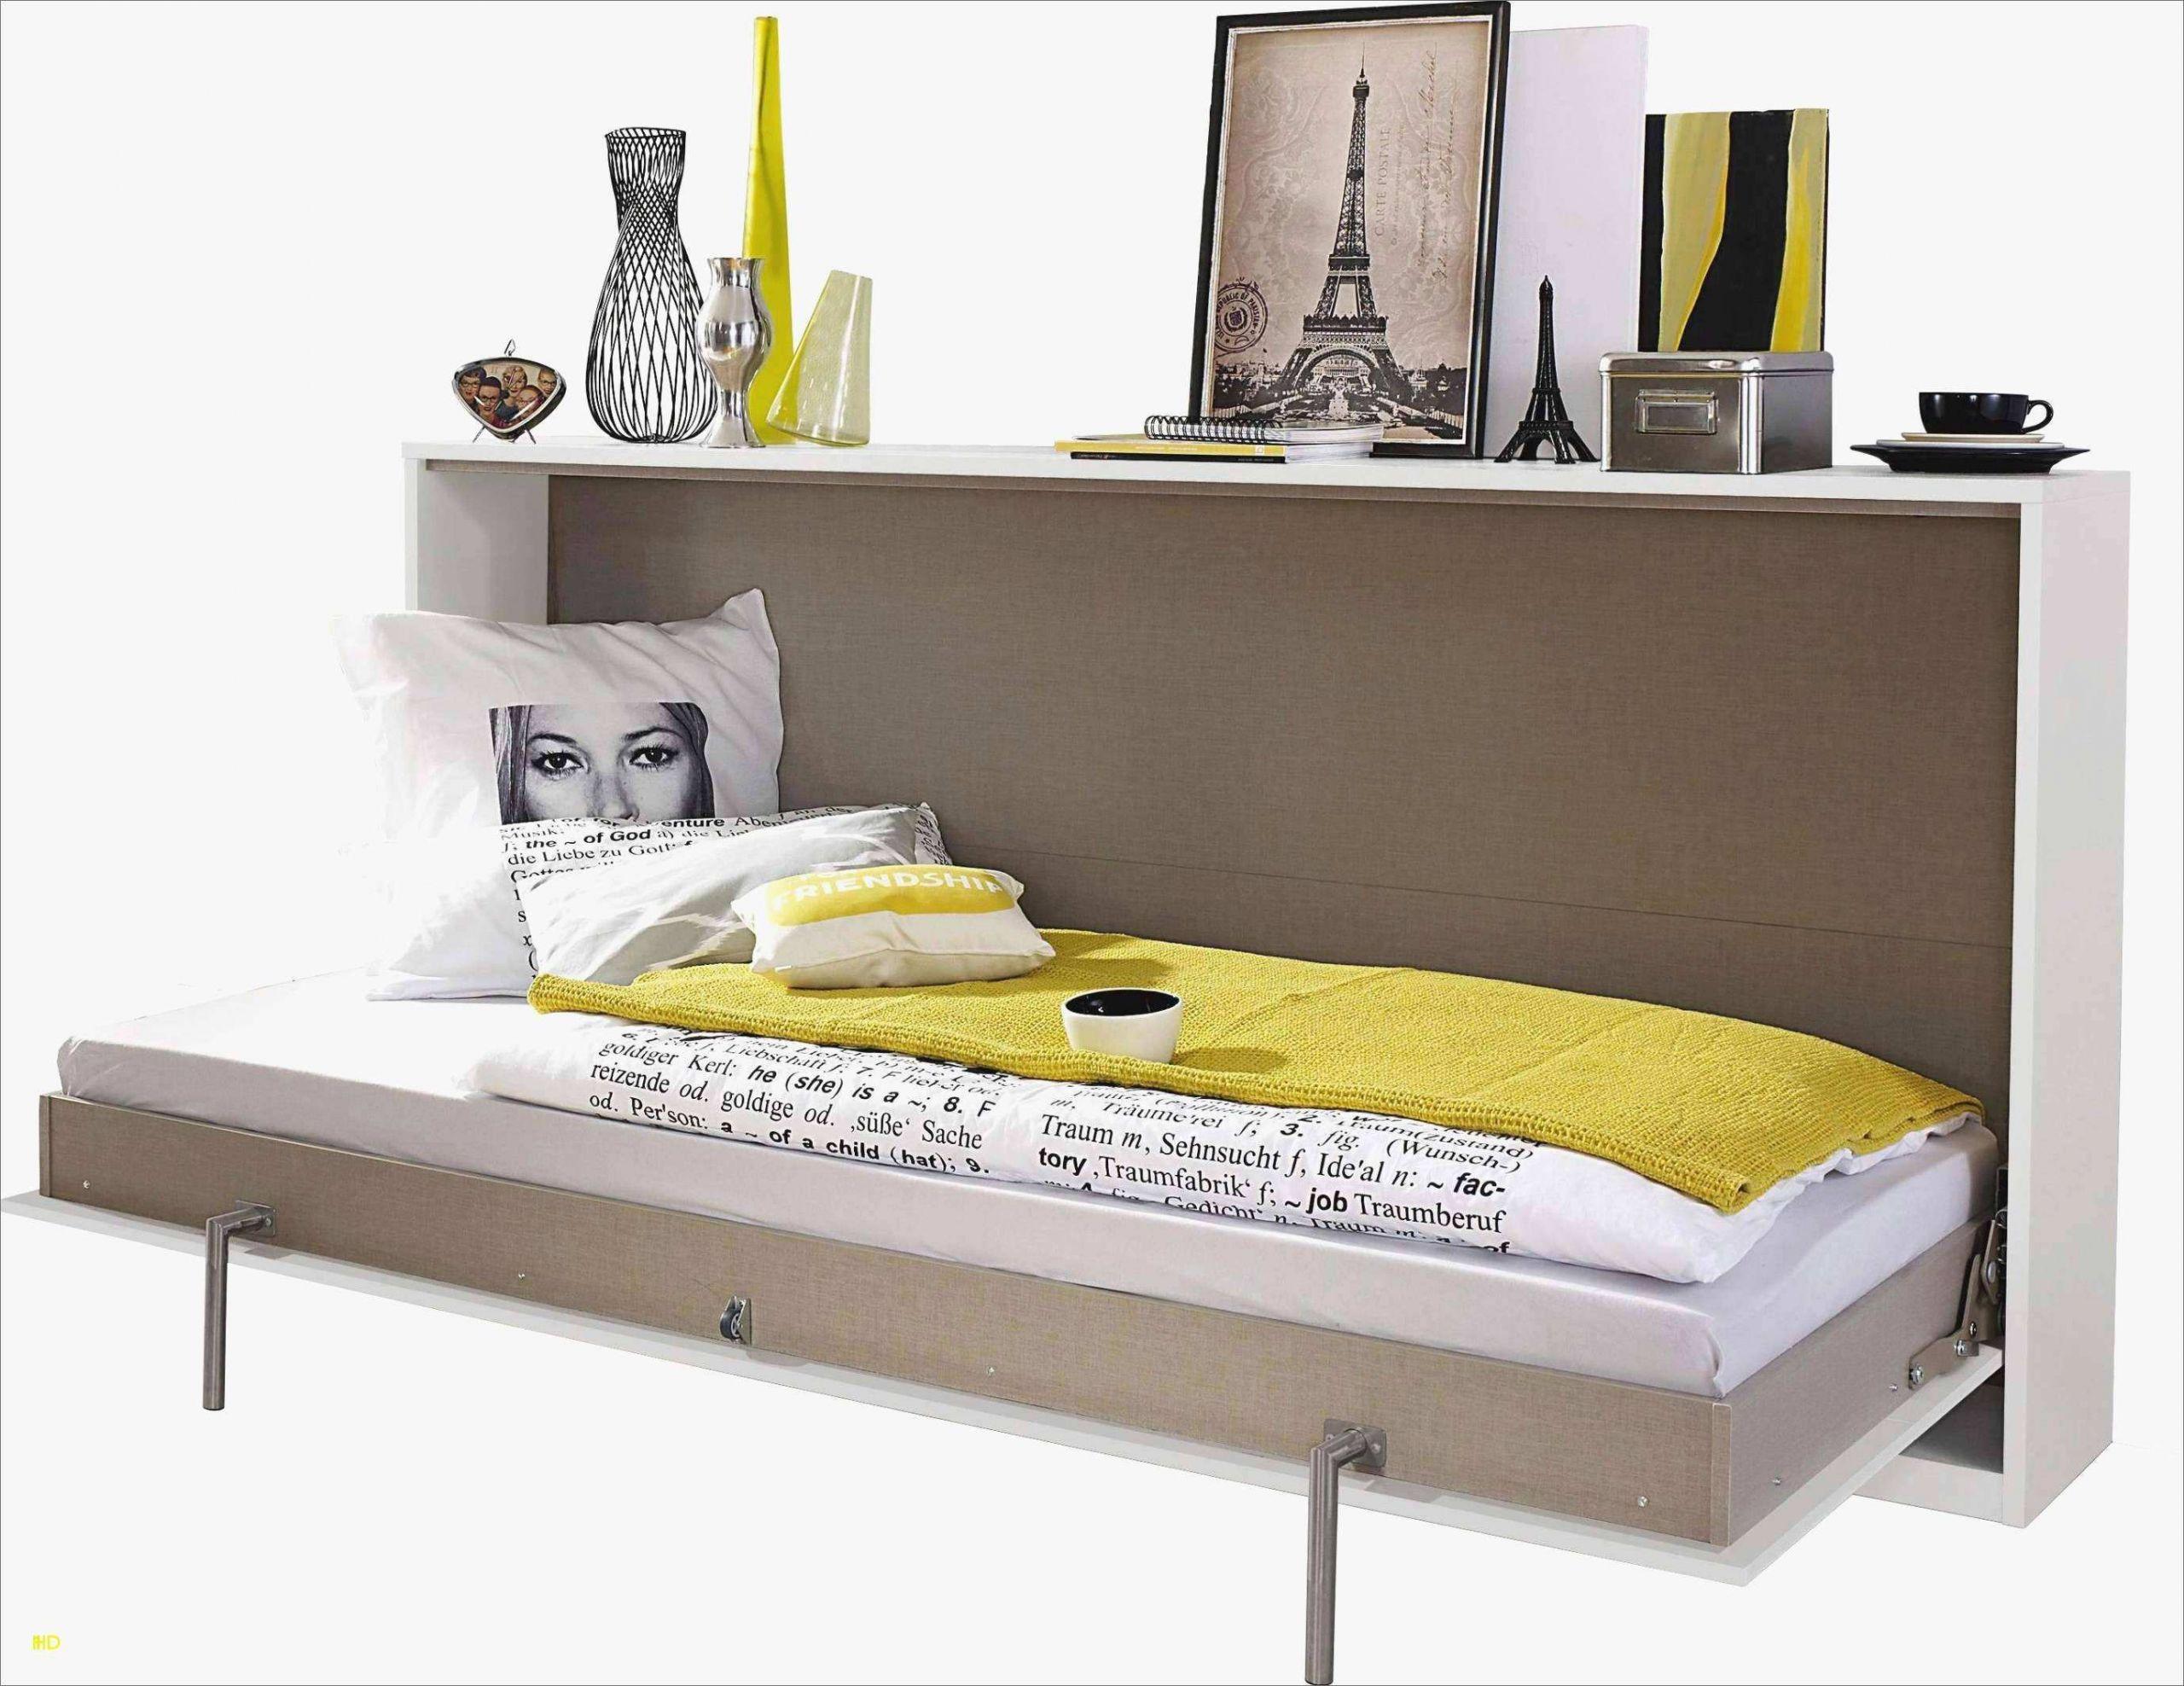 schone deko ideen frisch fresh schone deko ideen furs wohnzimmer inspirations of schone deko ideen